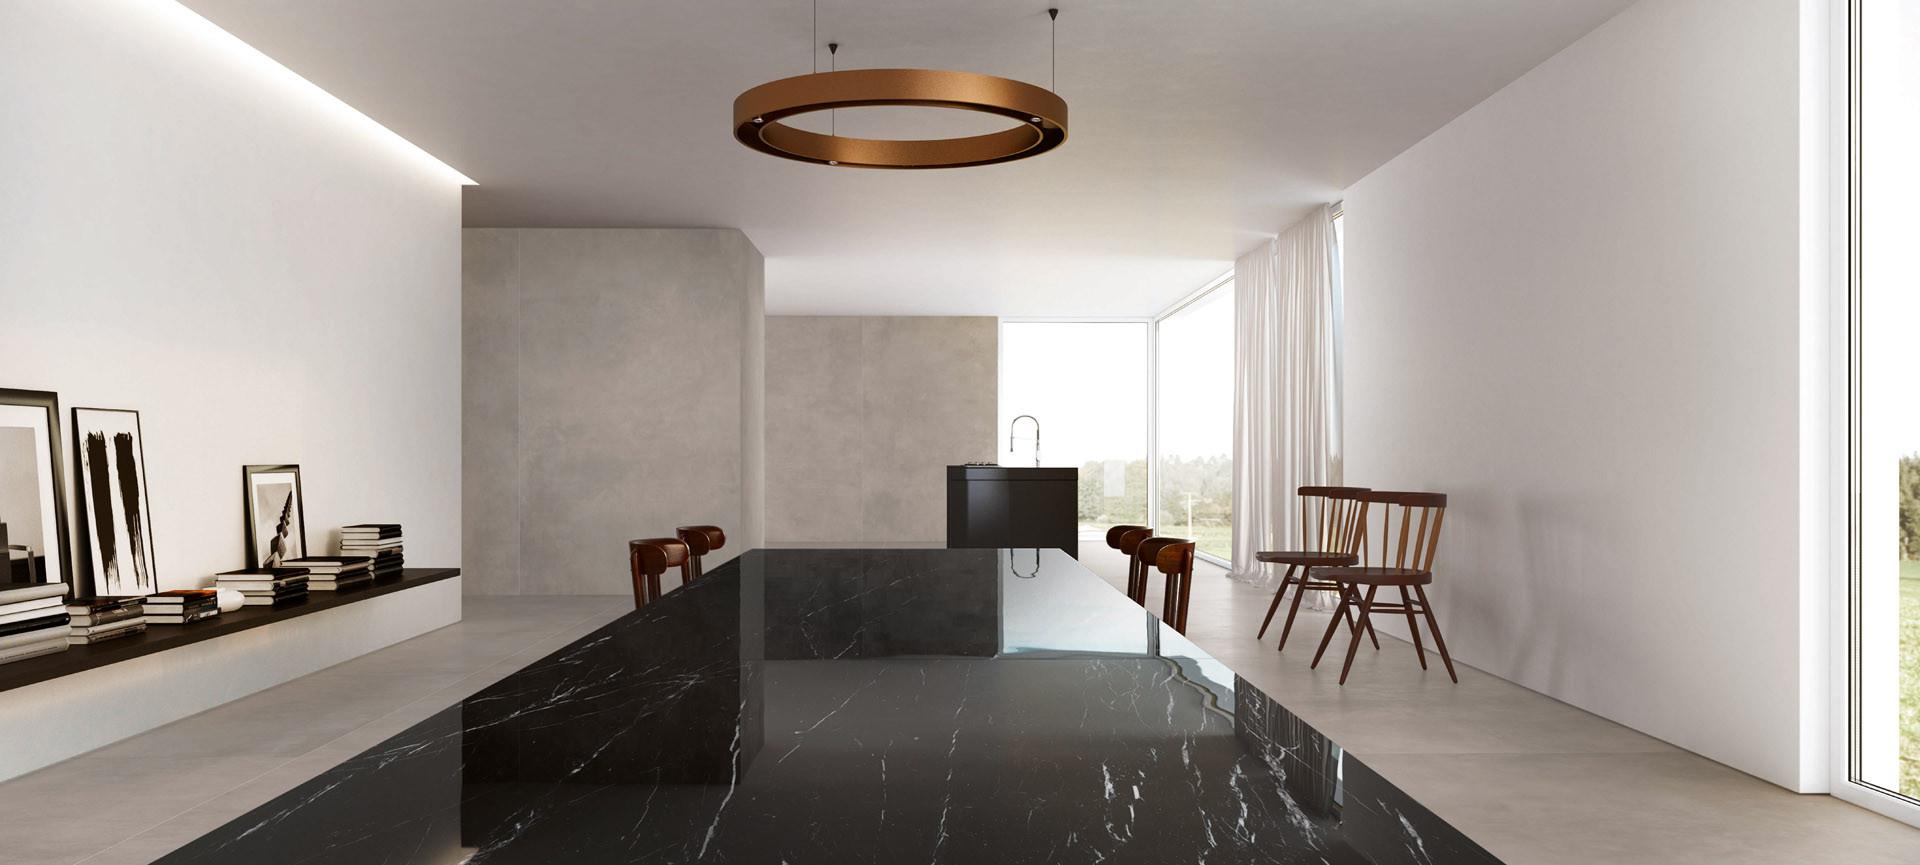 Marazzi_Grande_Marble_Look_Nero_Marquina